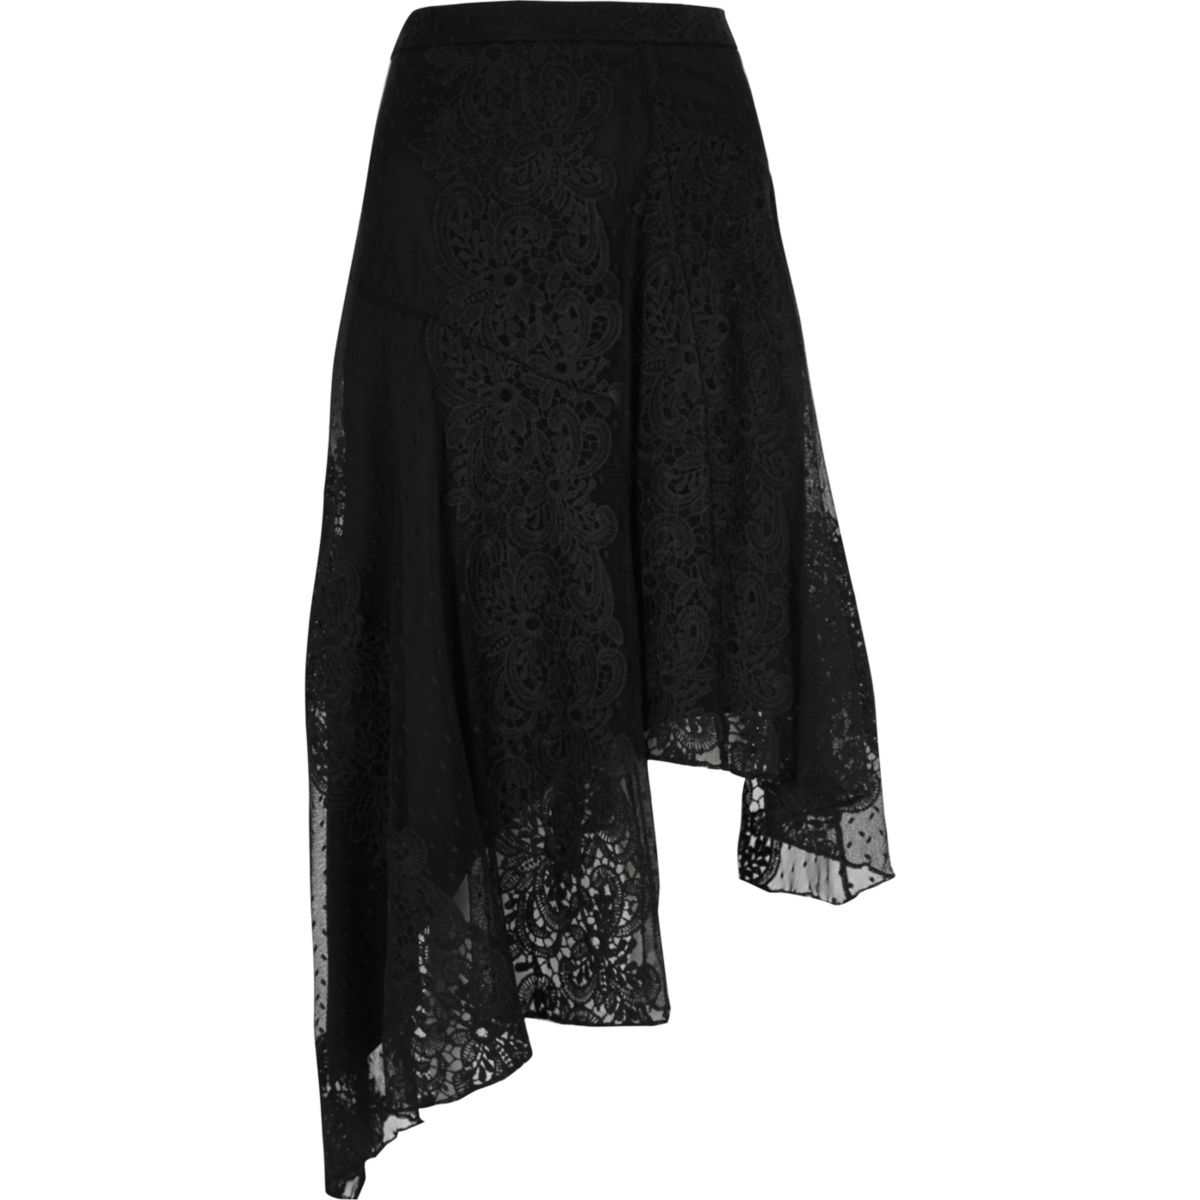 Black mesh and lace asymmetric midi skirt